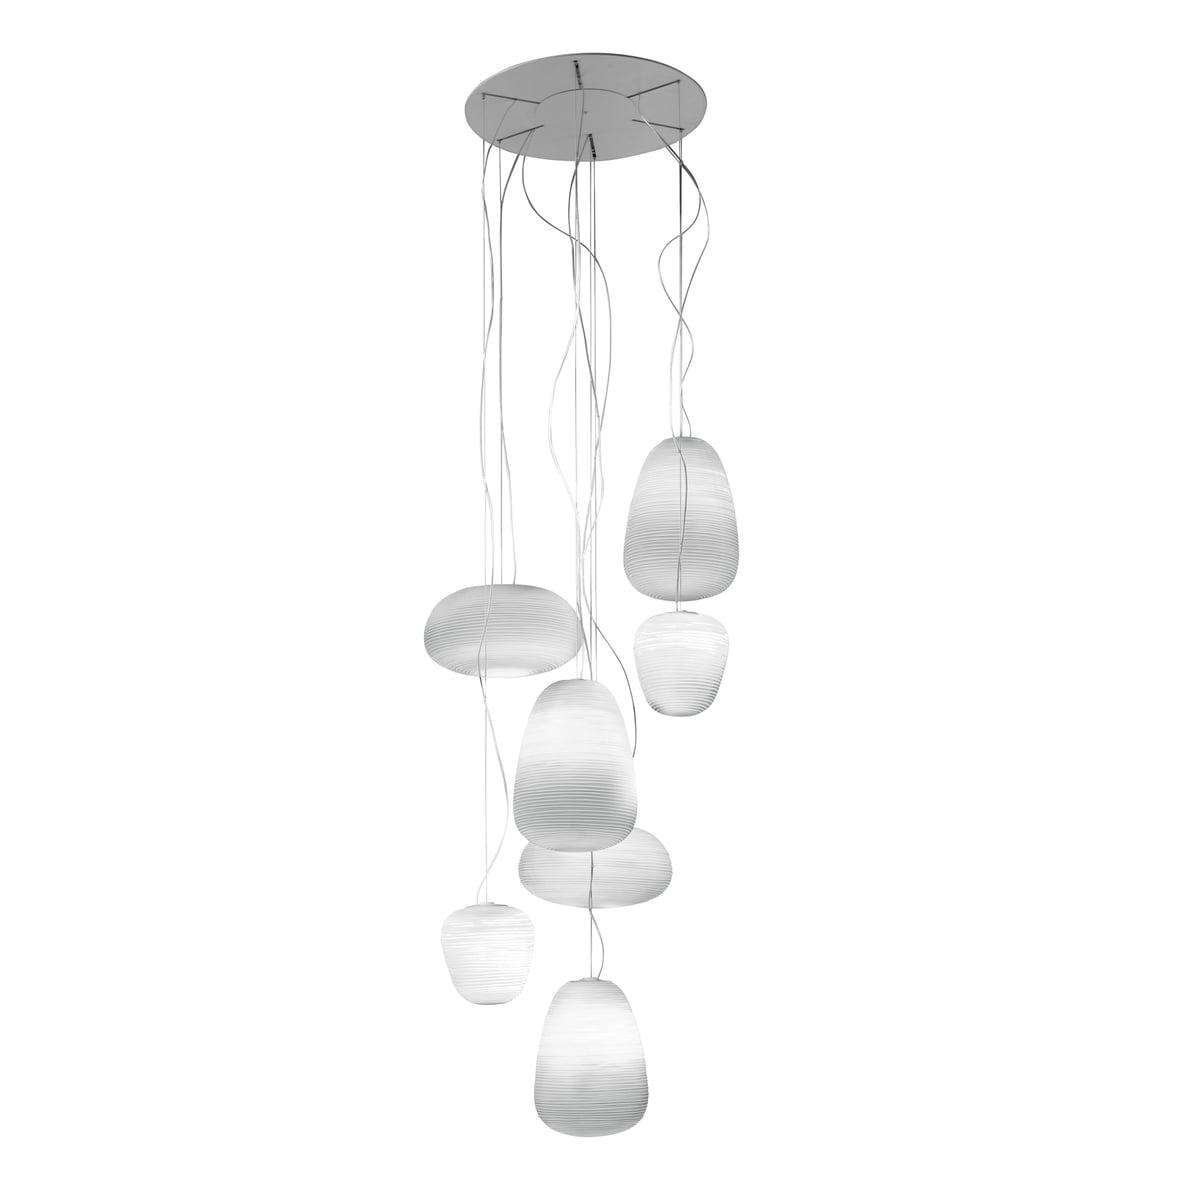 Rituals pendant lamp by foscarini in the shop foscarini rituals pendant lamp aloadofball Image collections